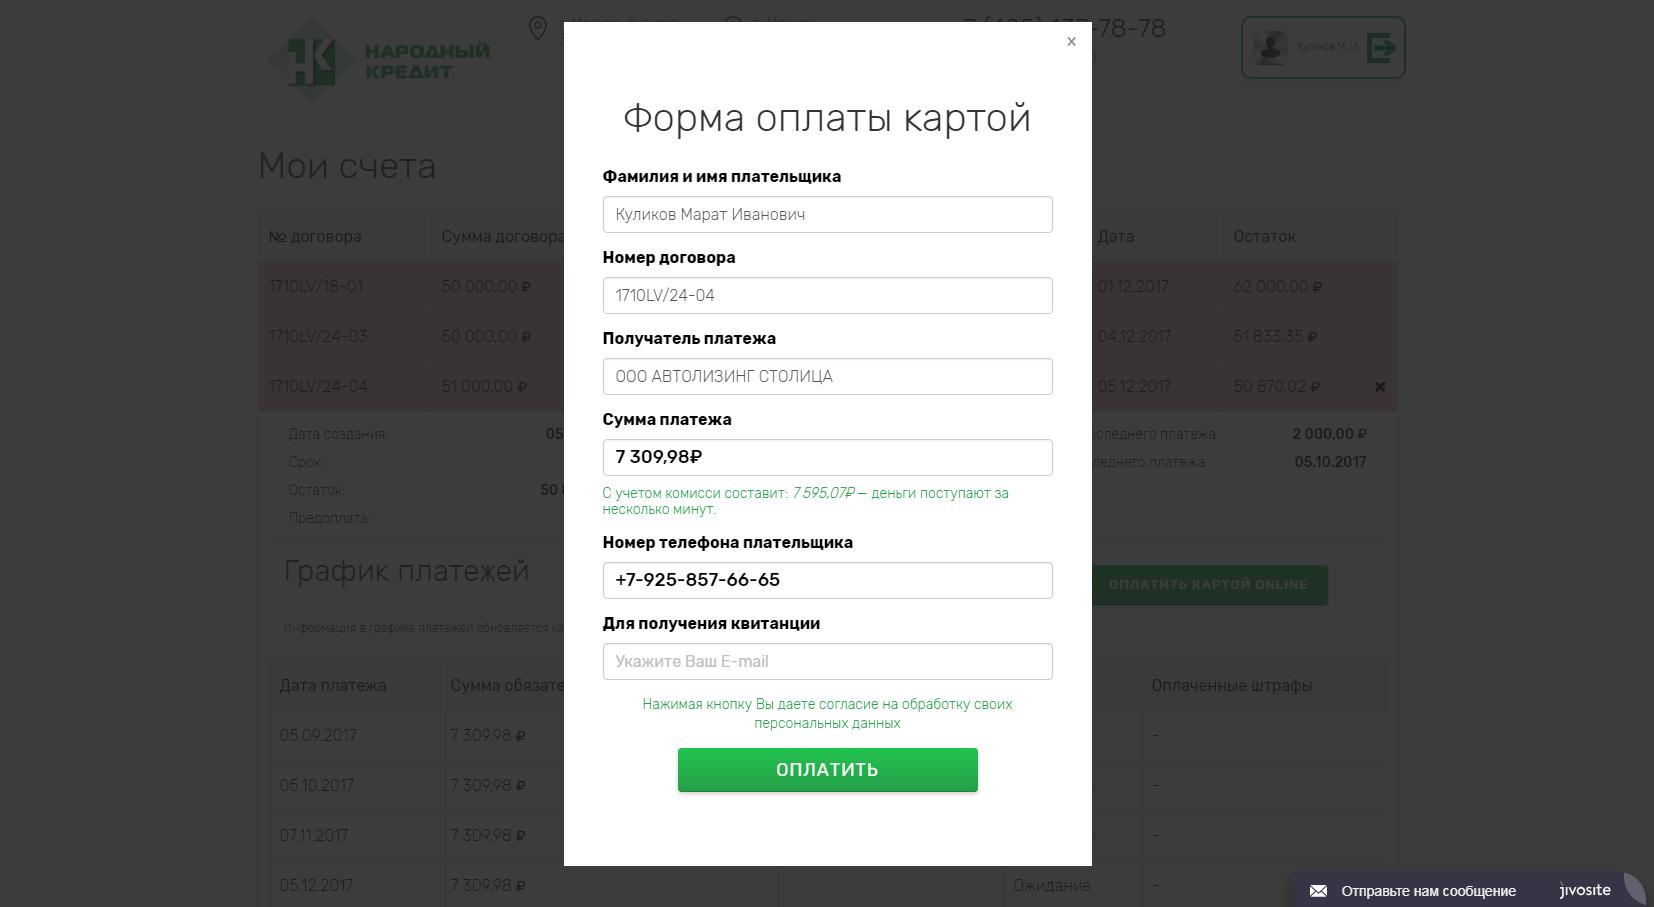 втб расчет кредита онлайн калькулятор